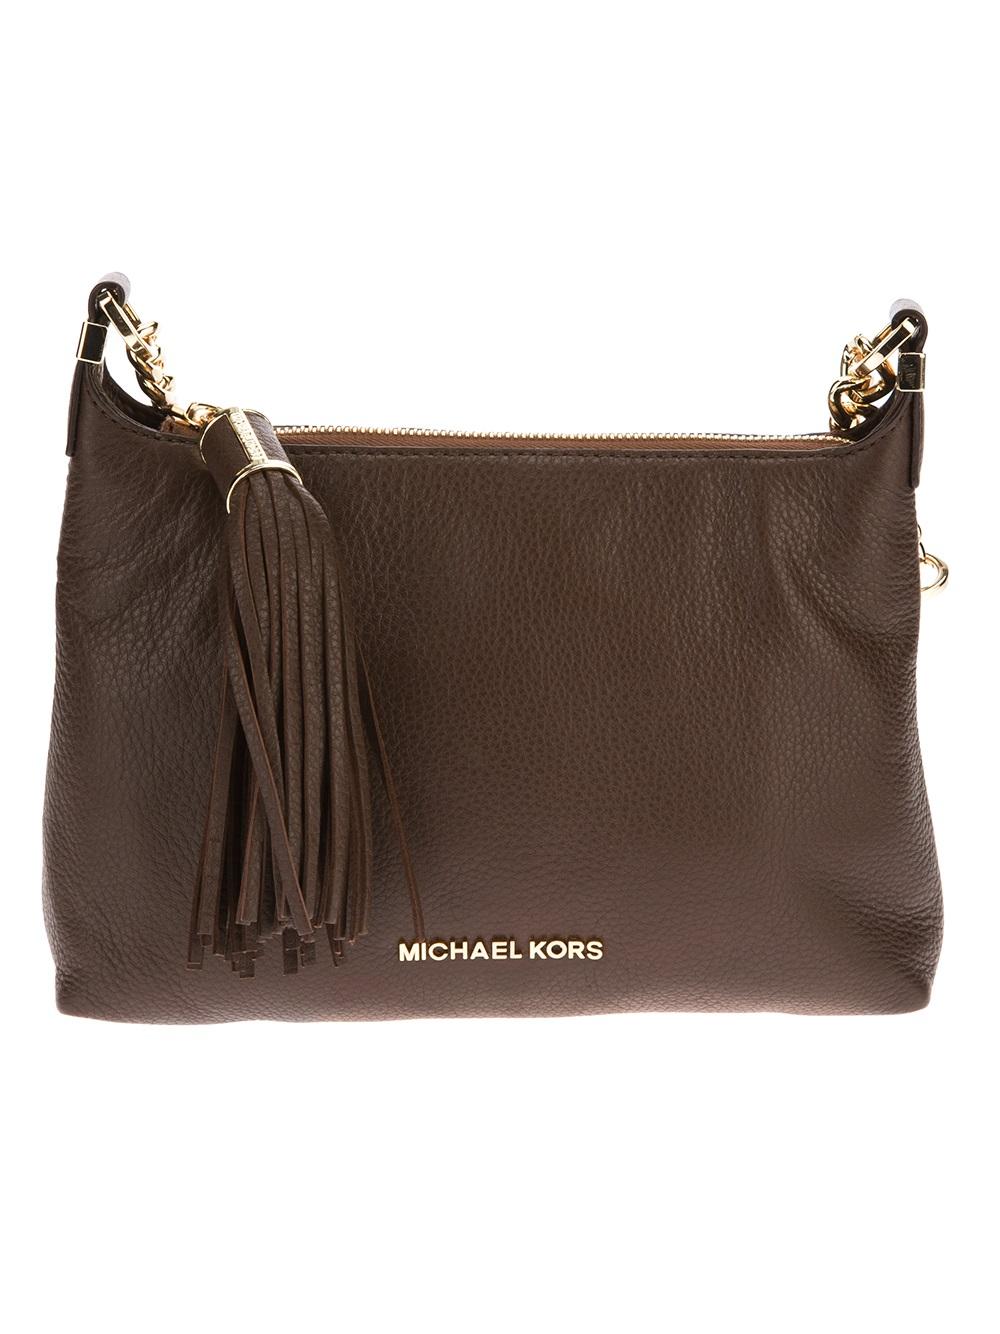 Lyst Michael Kors Weston Small Messenger Bag In Brown